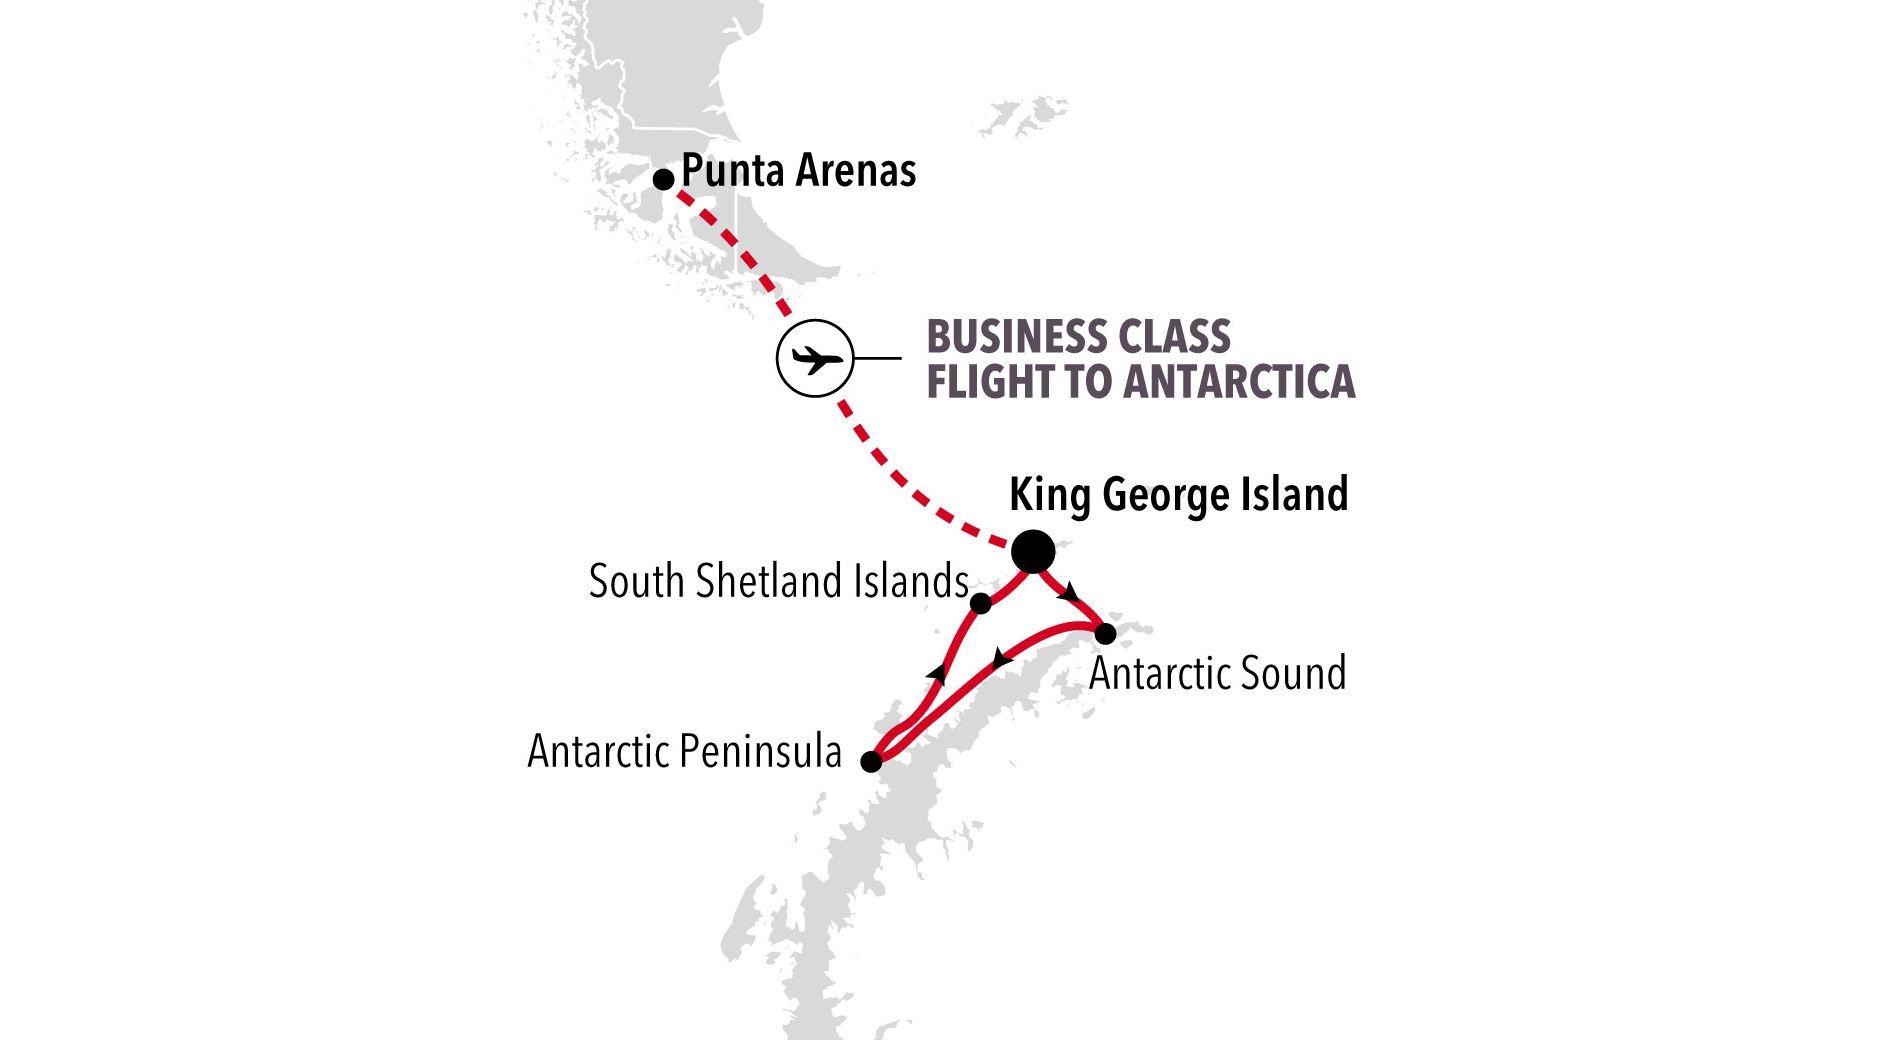 E1211229006 - King George Island a King George Island